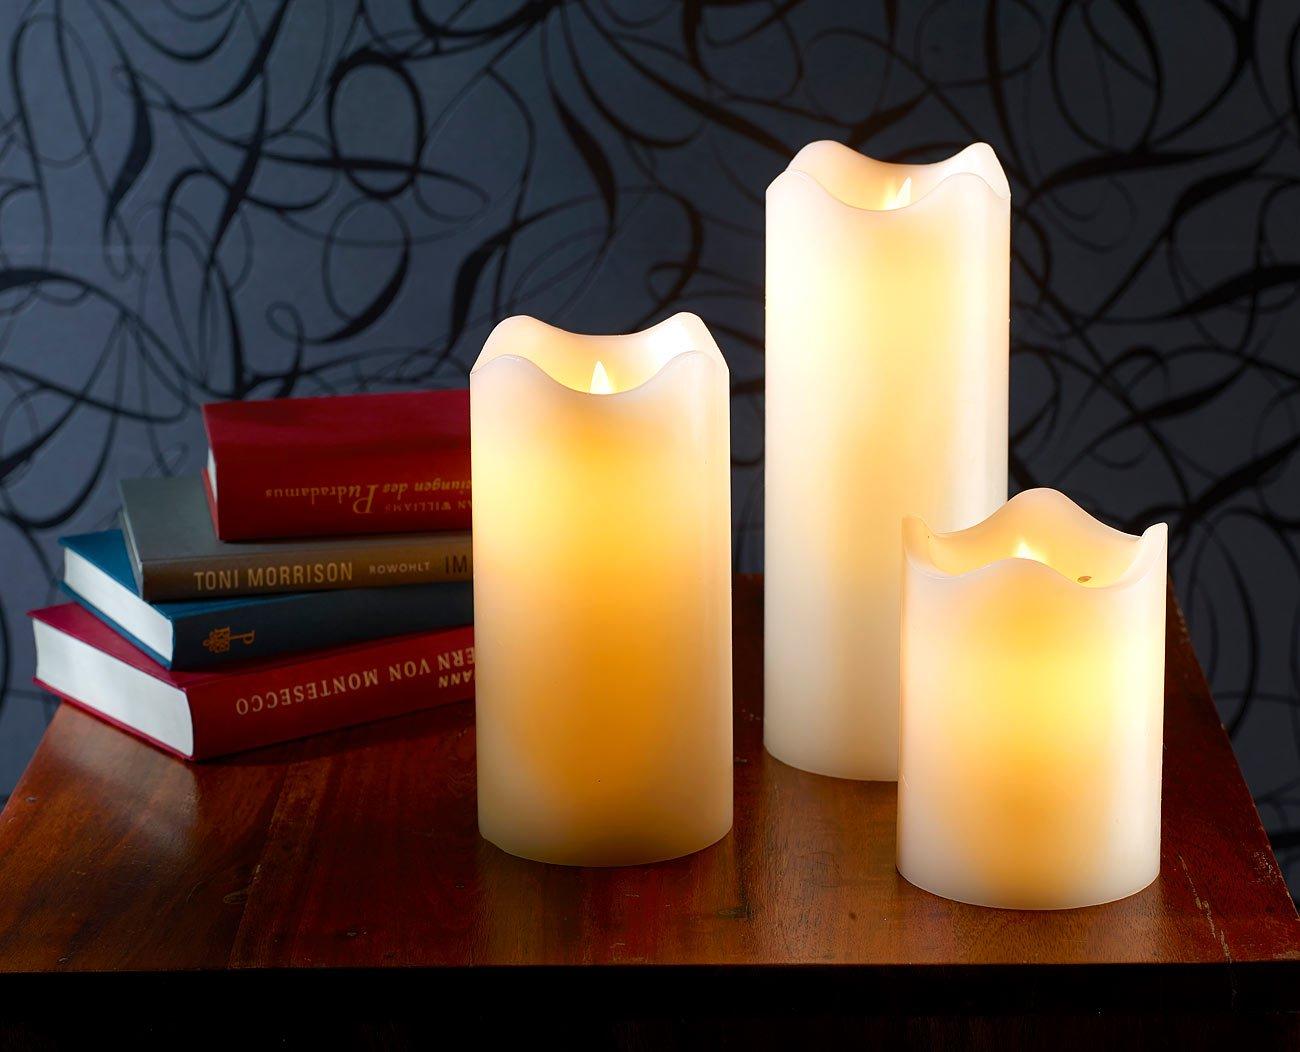 Britesta-Elektro-Kerzen-LED-Echtwachskerze-mit-beweglicher-Flamme-23-cm-hoch-Kerzen-LED